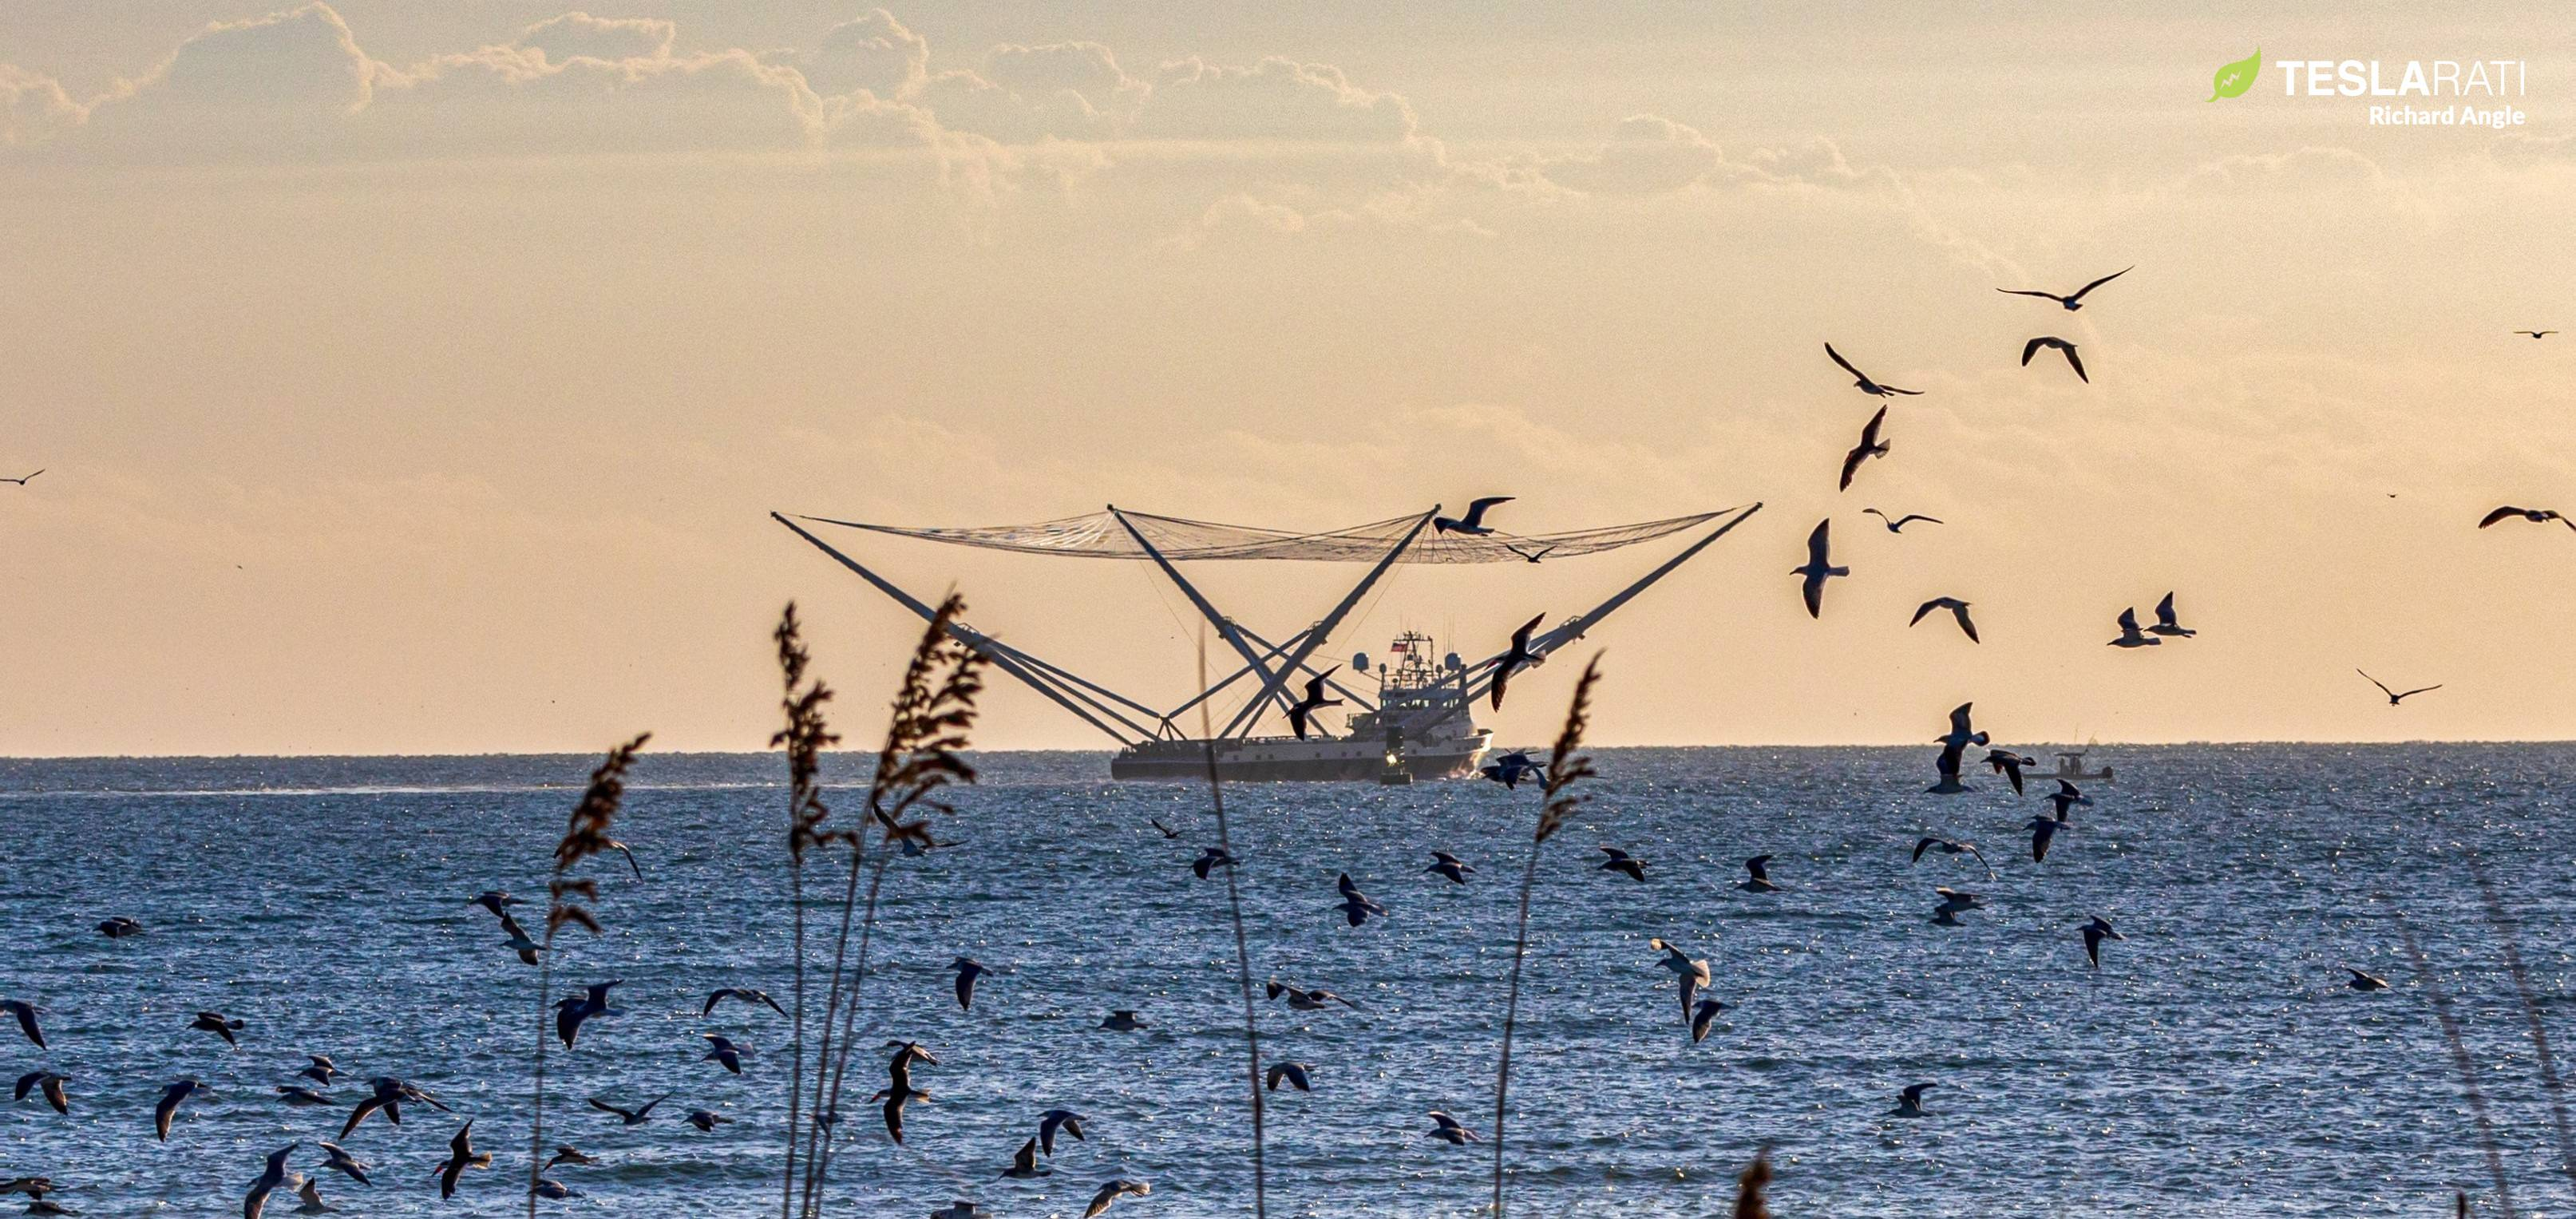 GO Ms Chief sea trials 102319 (Richard Angle – Teslarati) (6) crop (c)